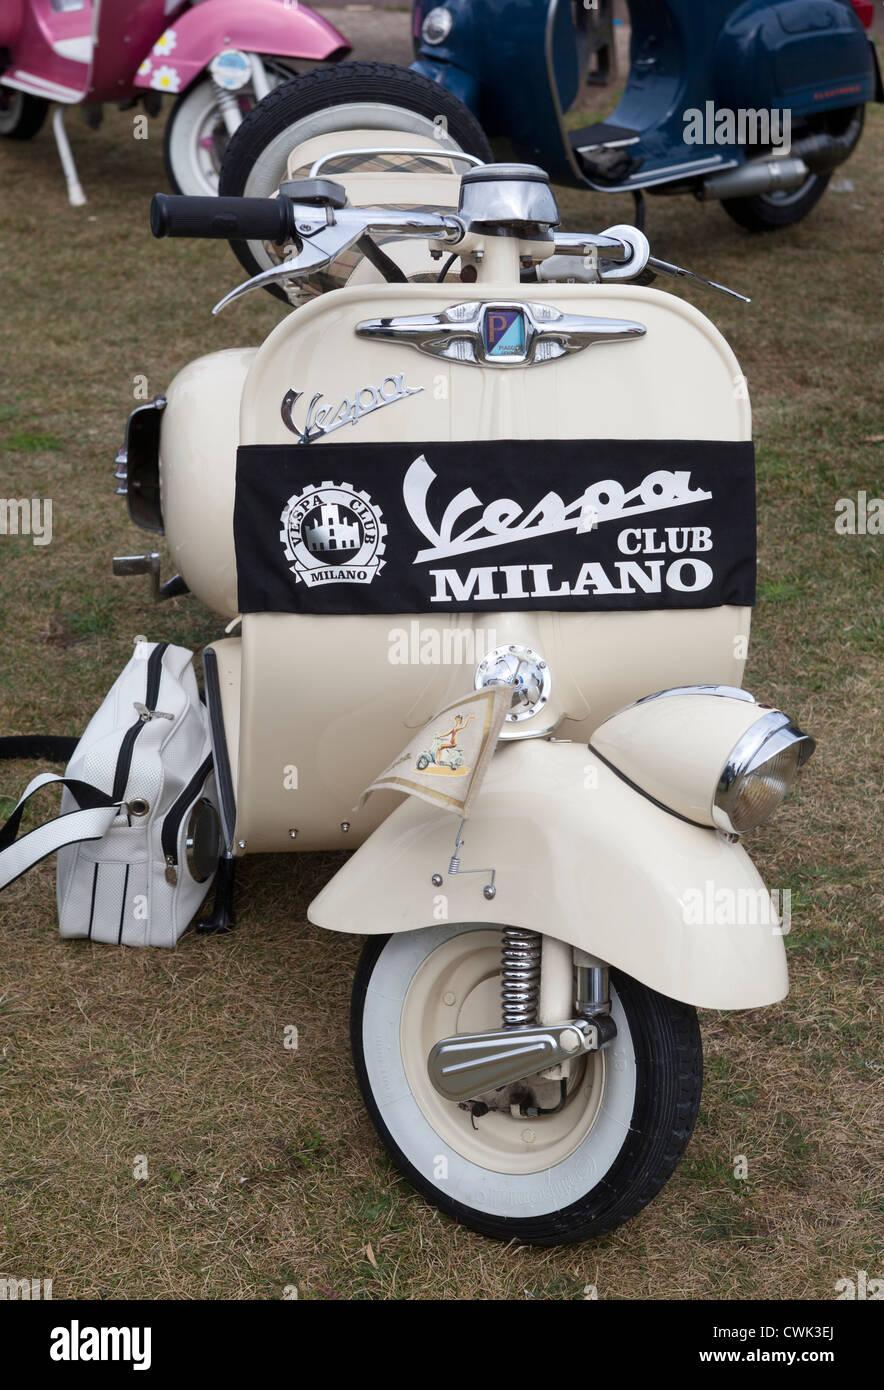 Classic Vespa Scooter with Milano Club Sash - Stock Image